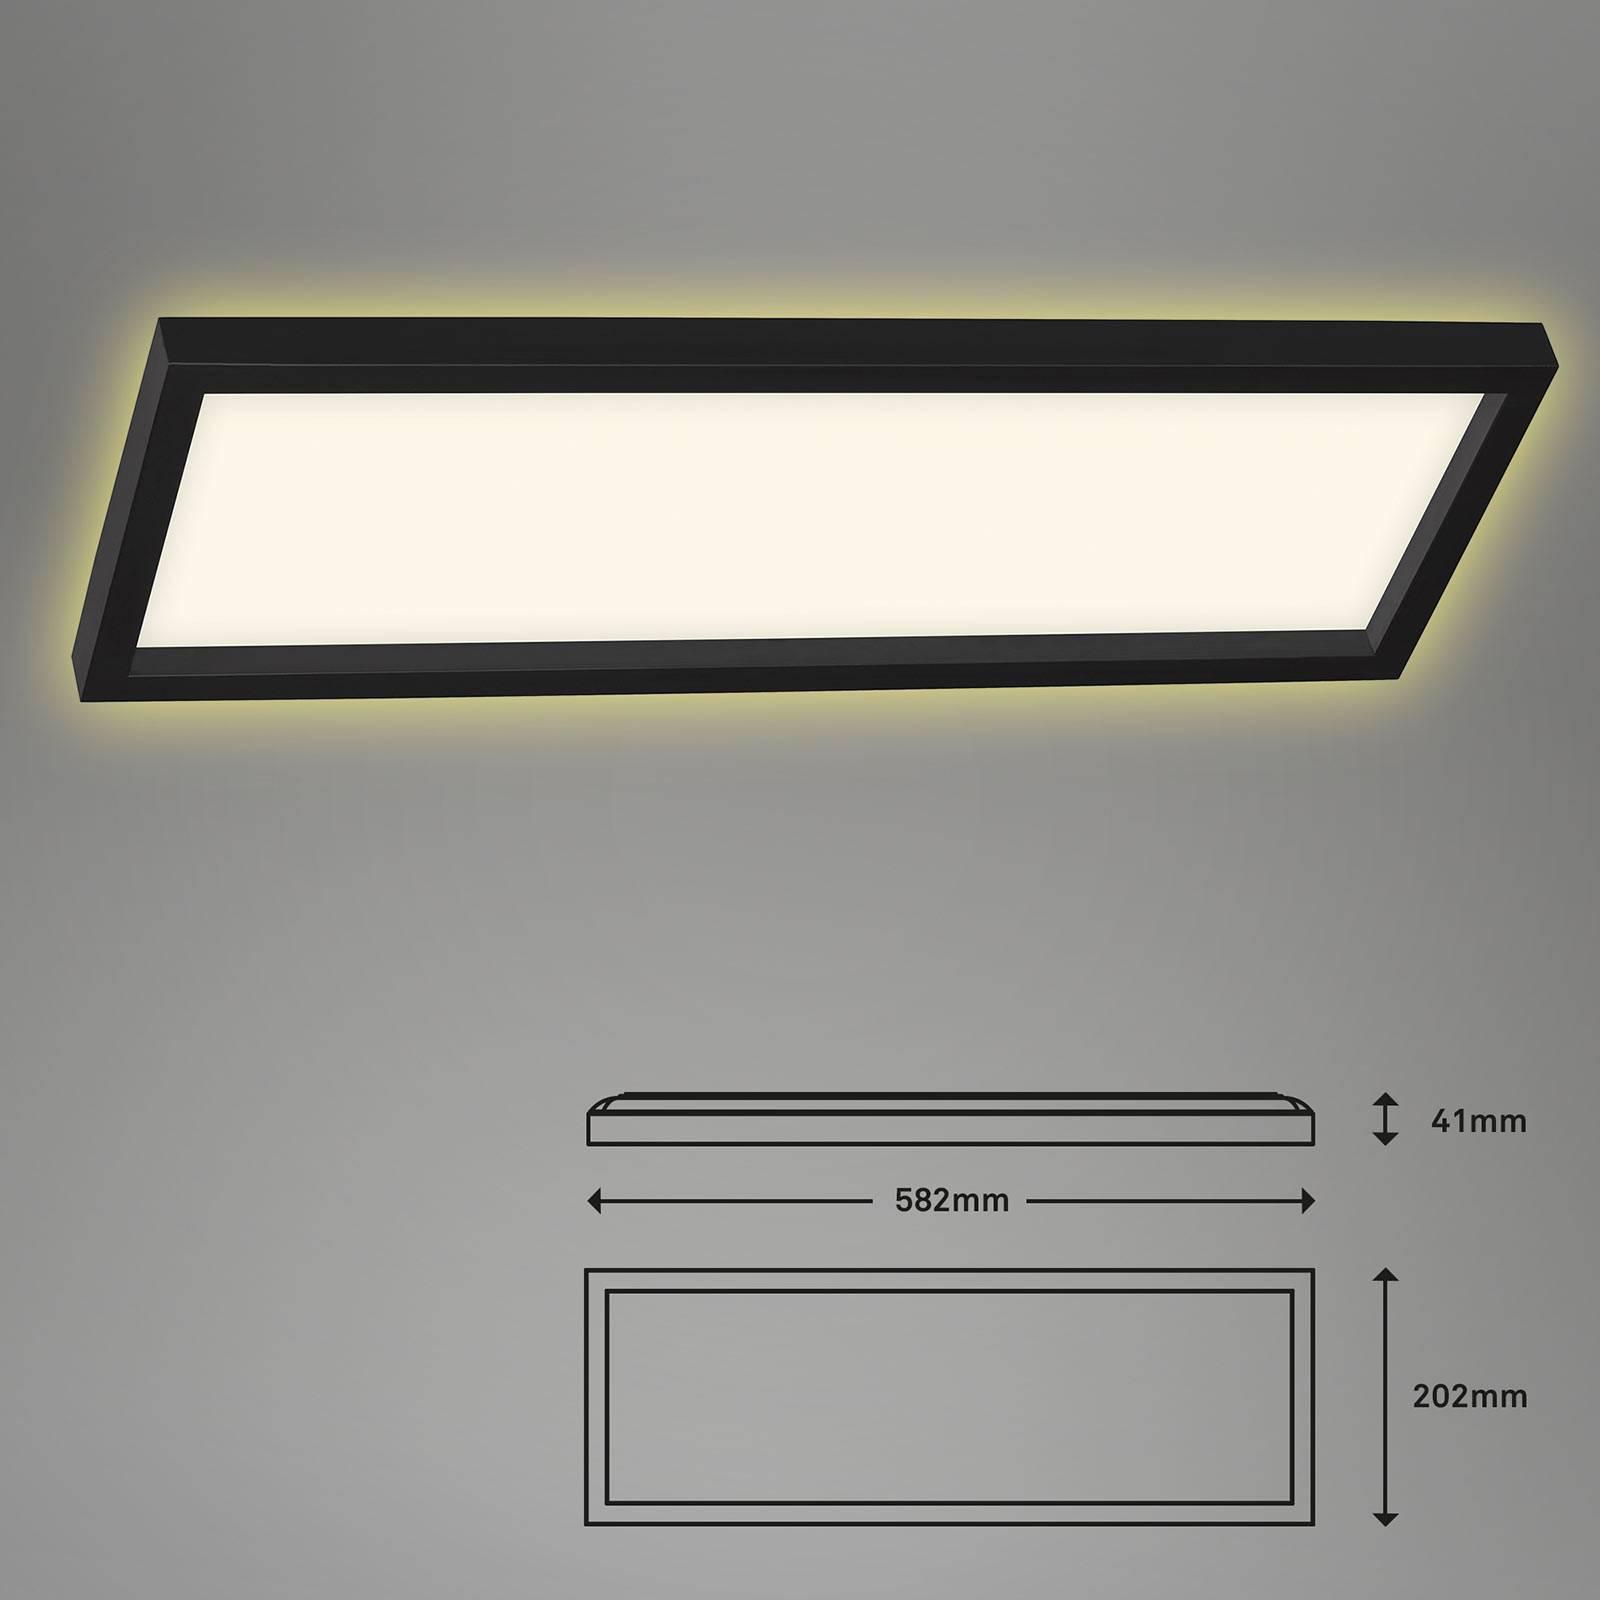 LED-kattovalaisin 7365, 58 x 20 cm, musta